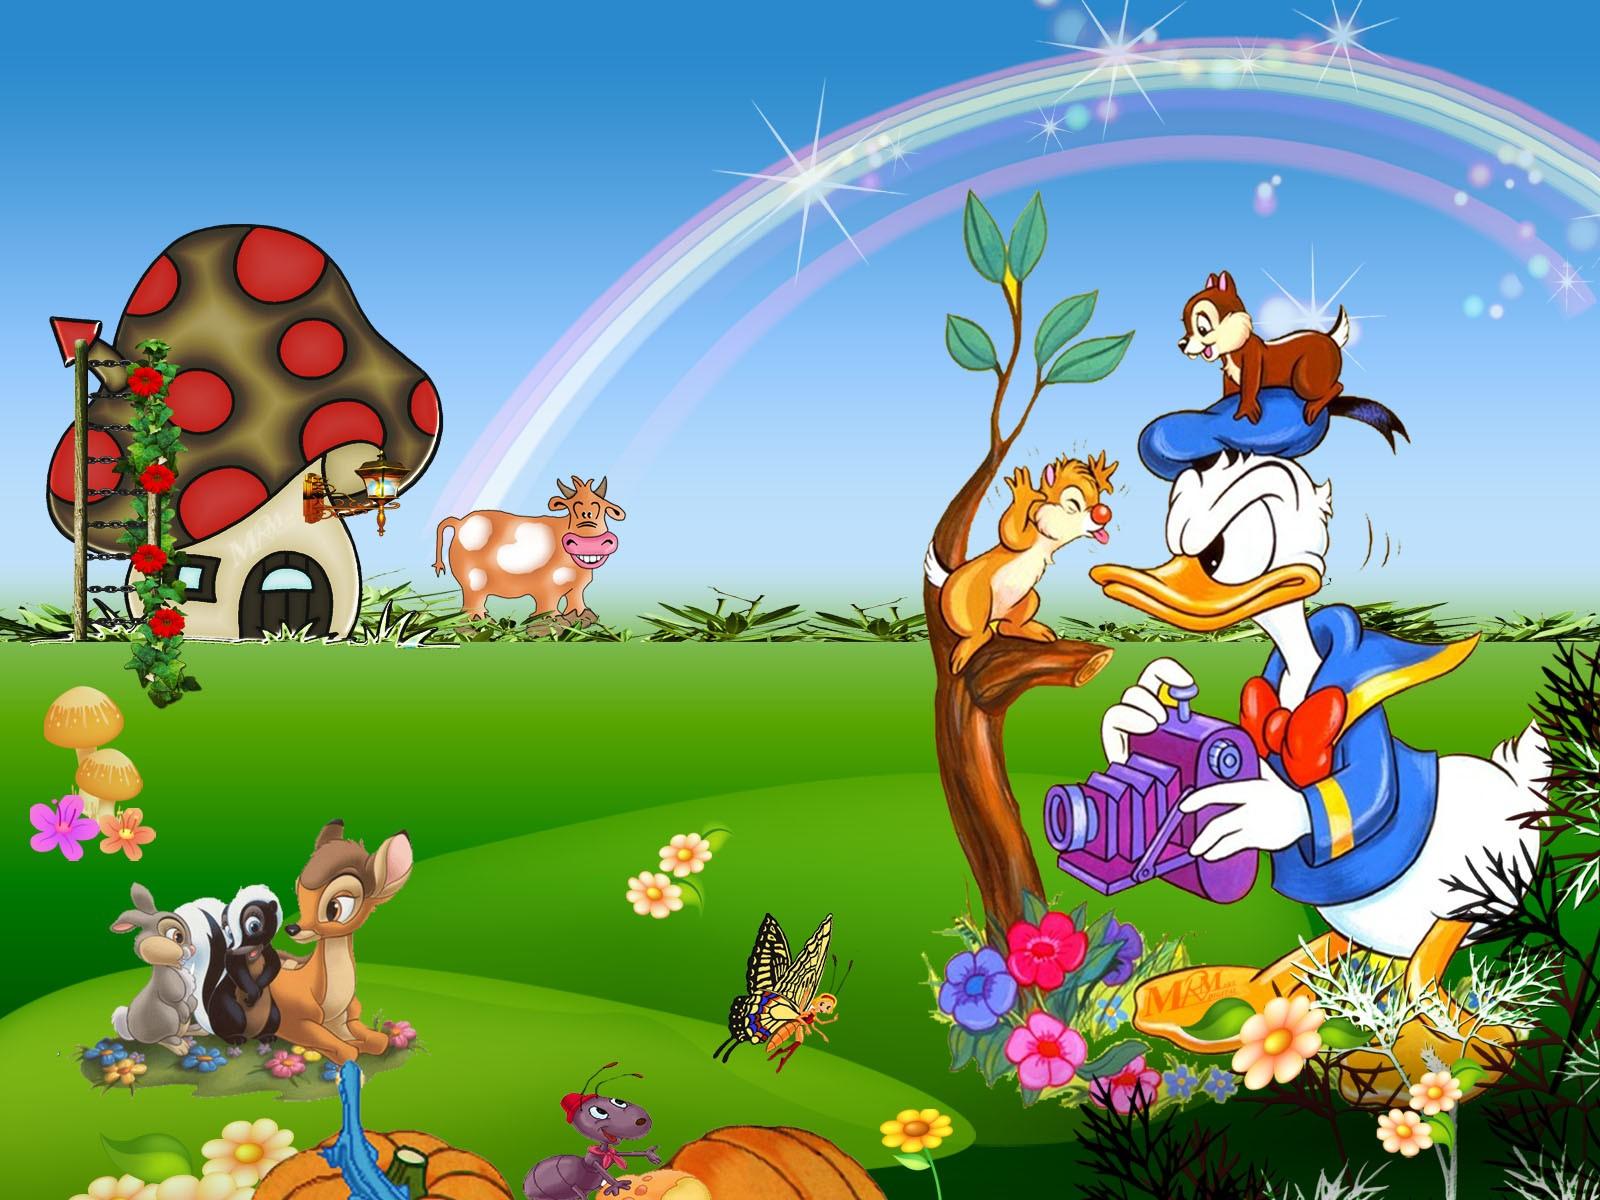 Cartoon hd wallpaper, cartoon wallpaper | Amazing Wallpapers